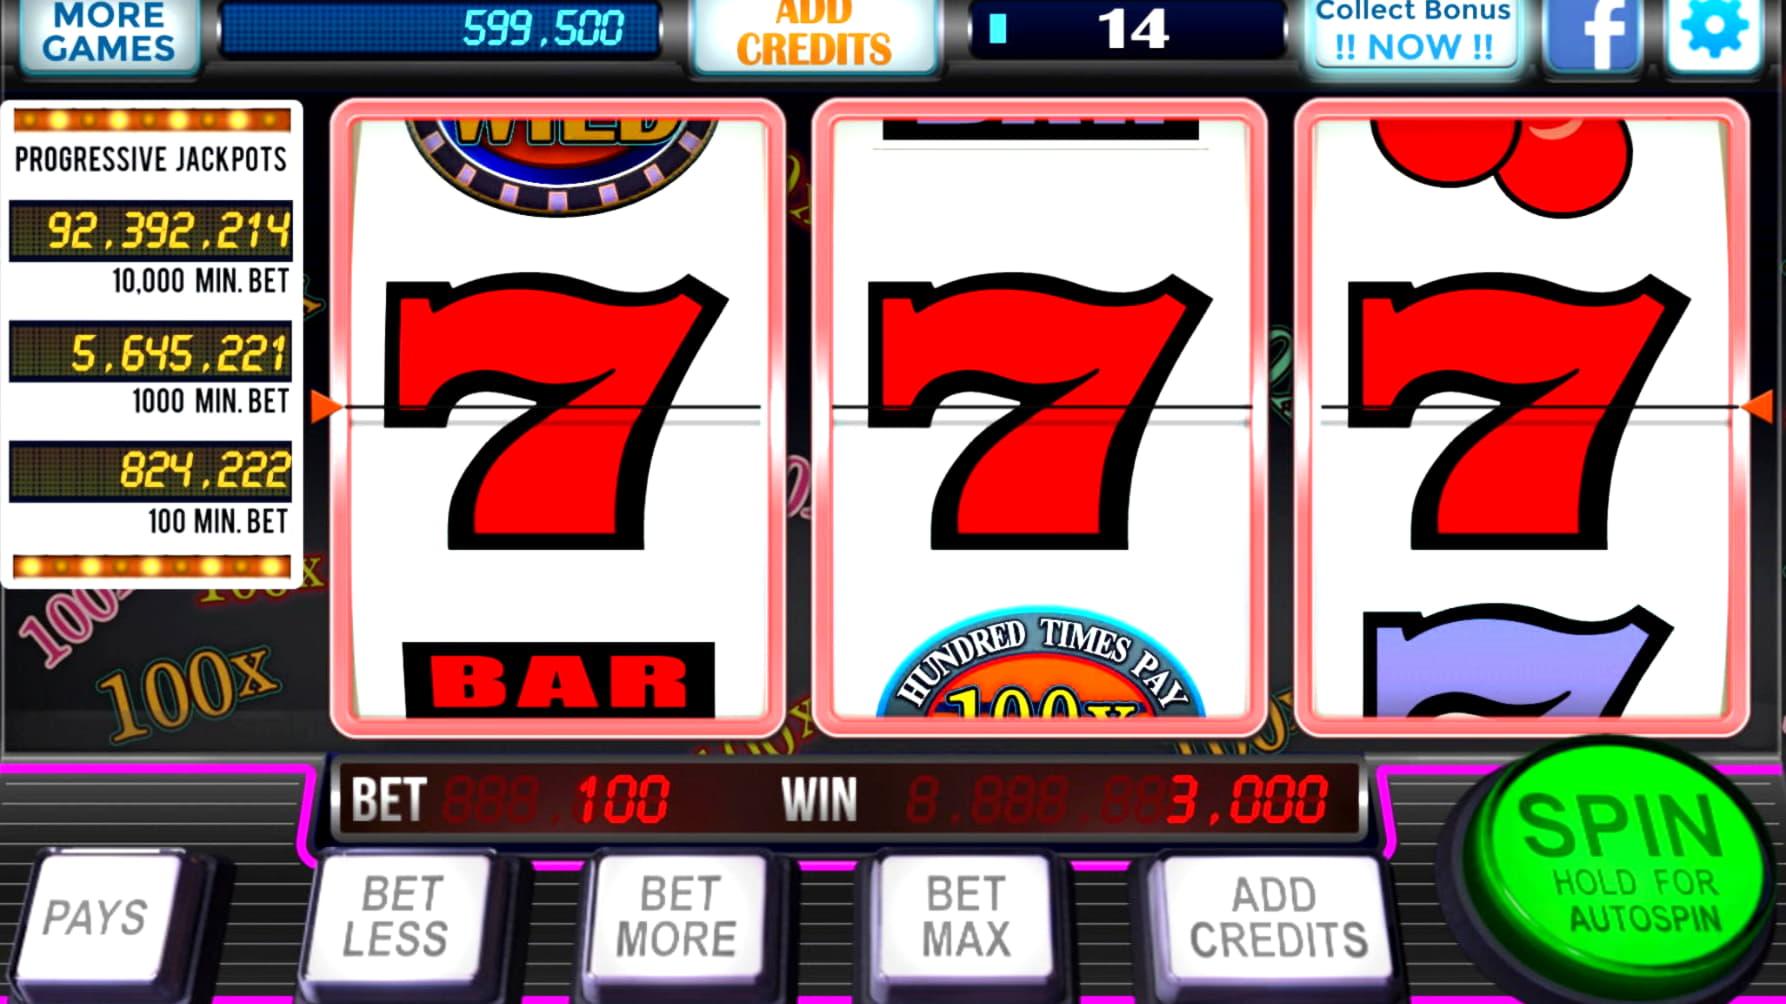 $505 casino chip at Mansion Casino